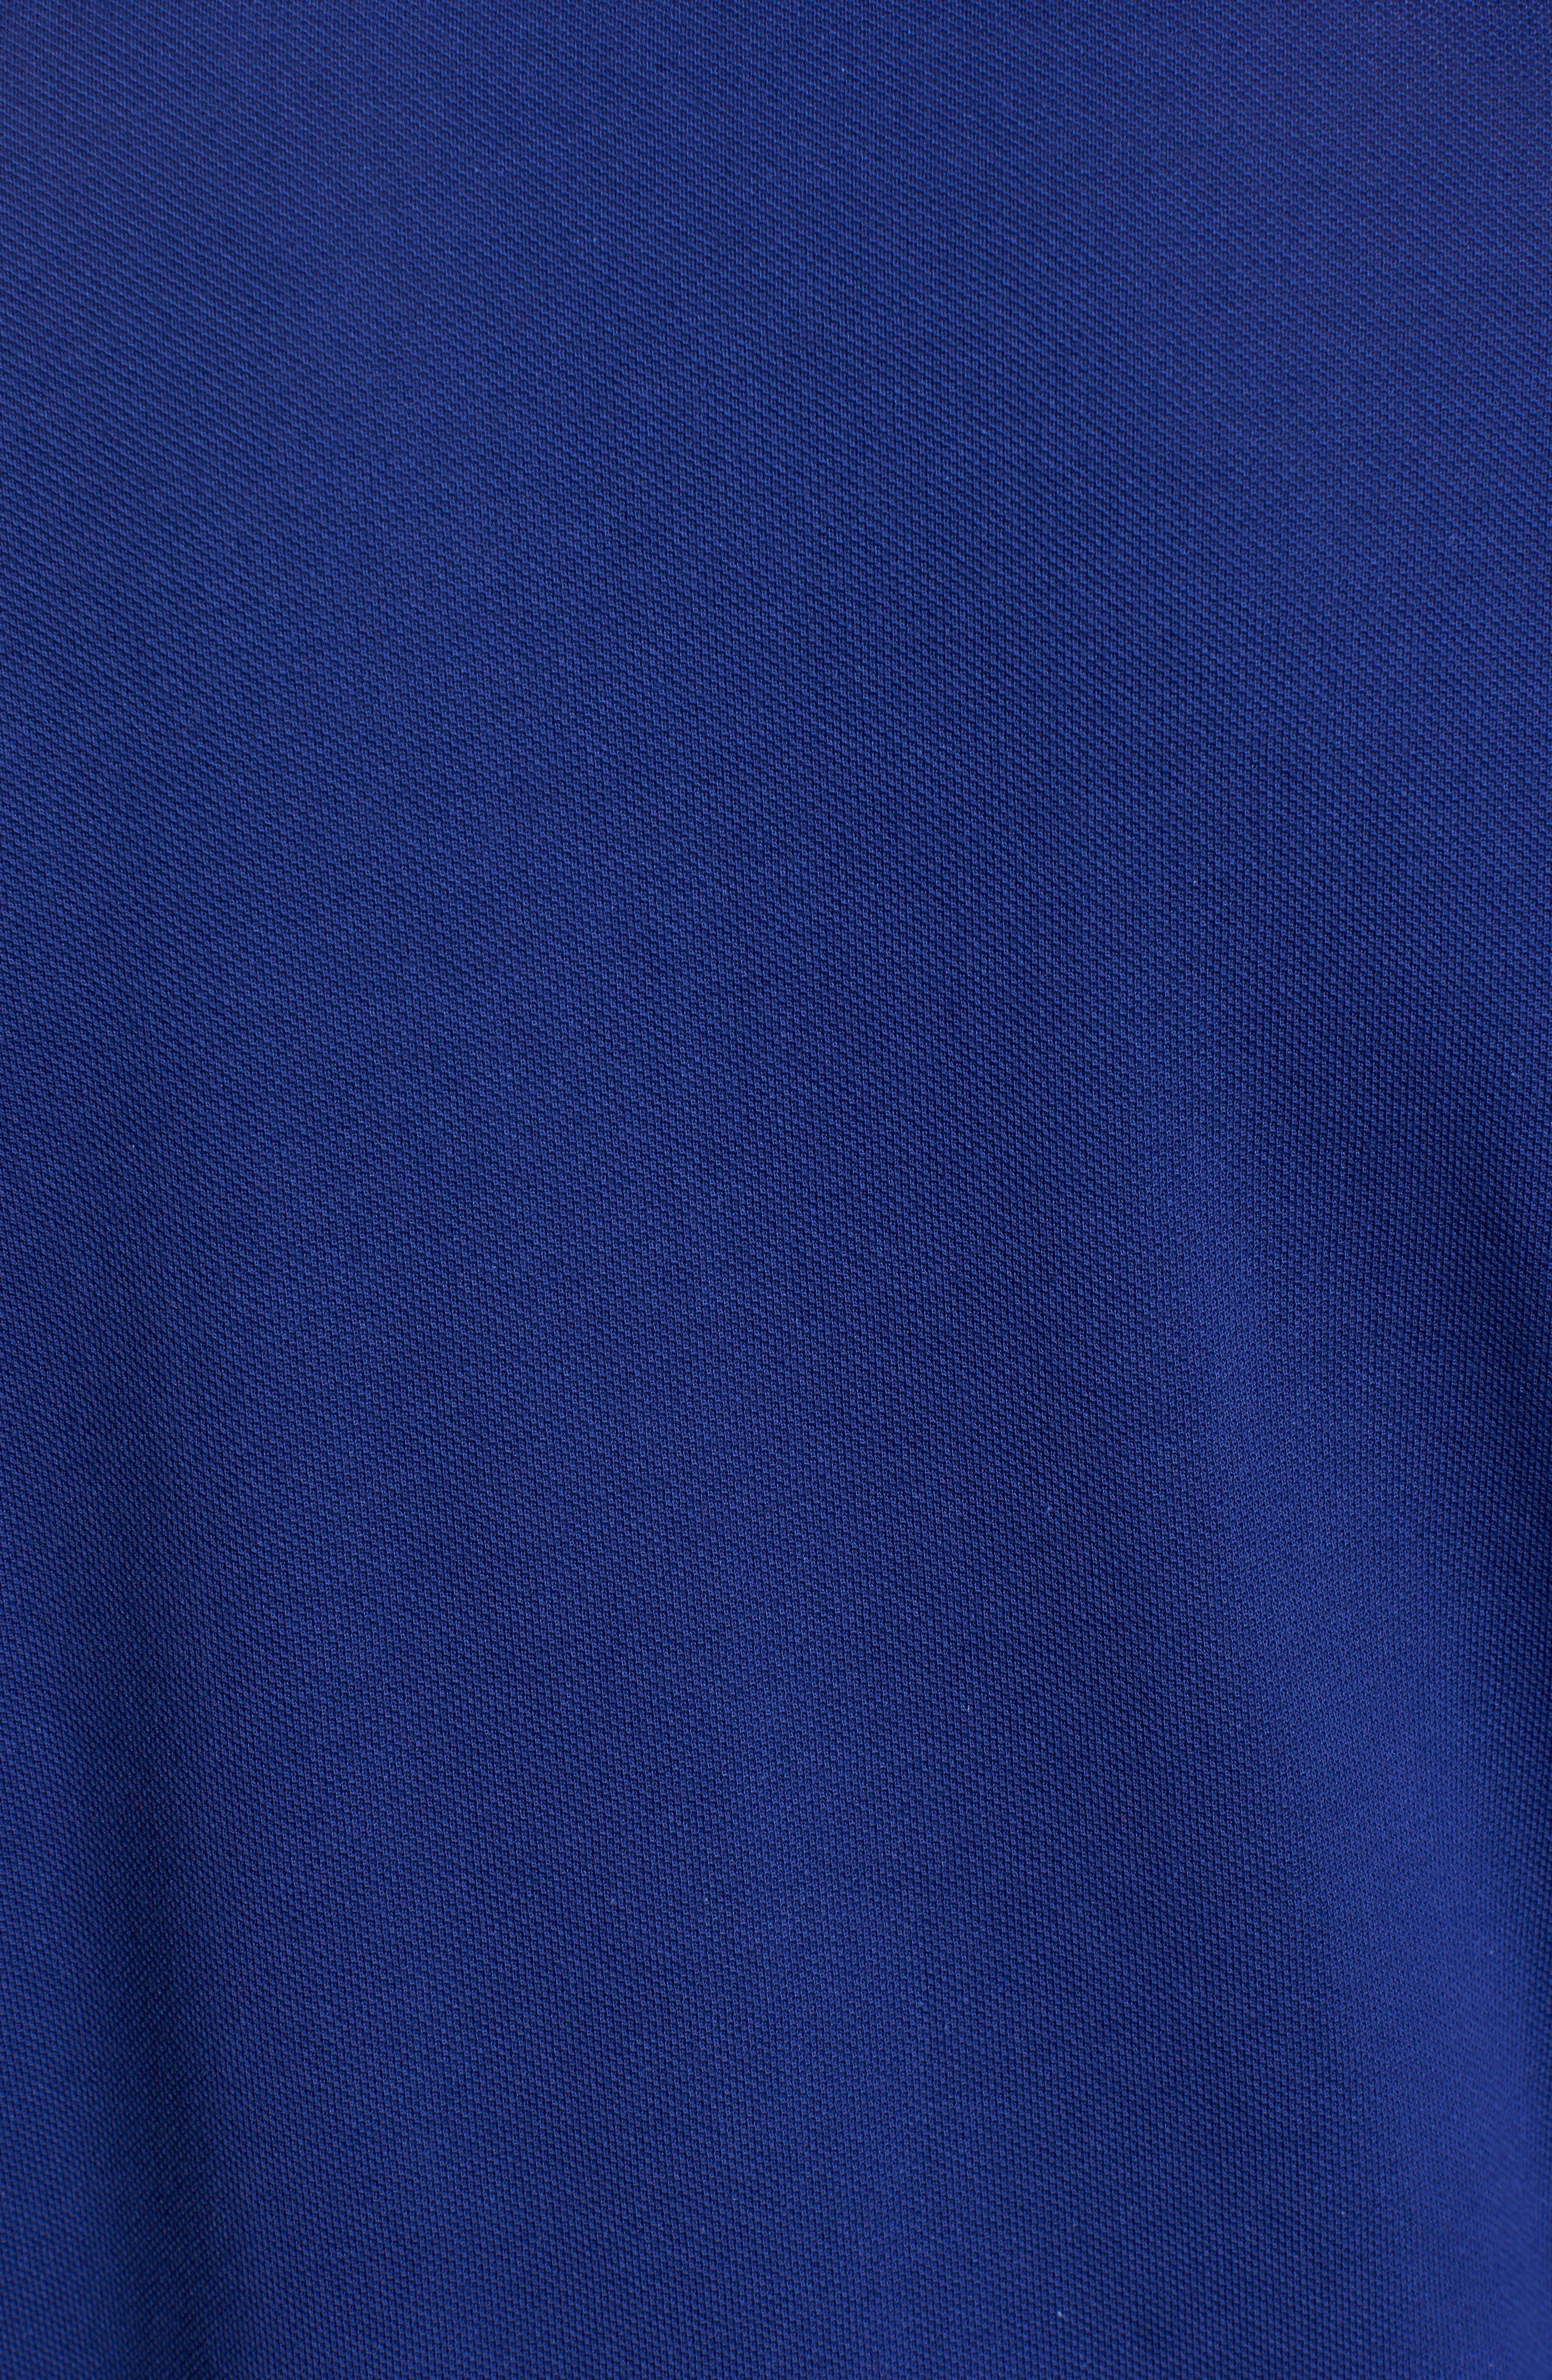 LACOSTE, Classic Fit Long Sleeve Piqué Polo, Alternate thumbnail 5, color, OCEAN